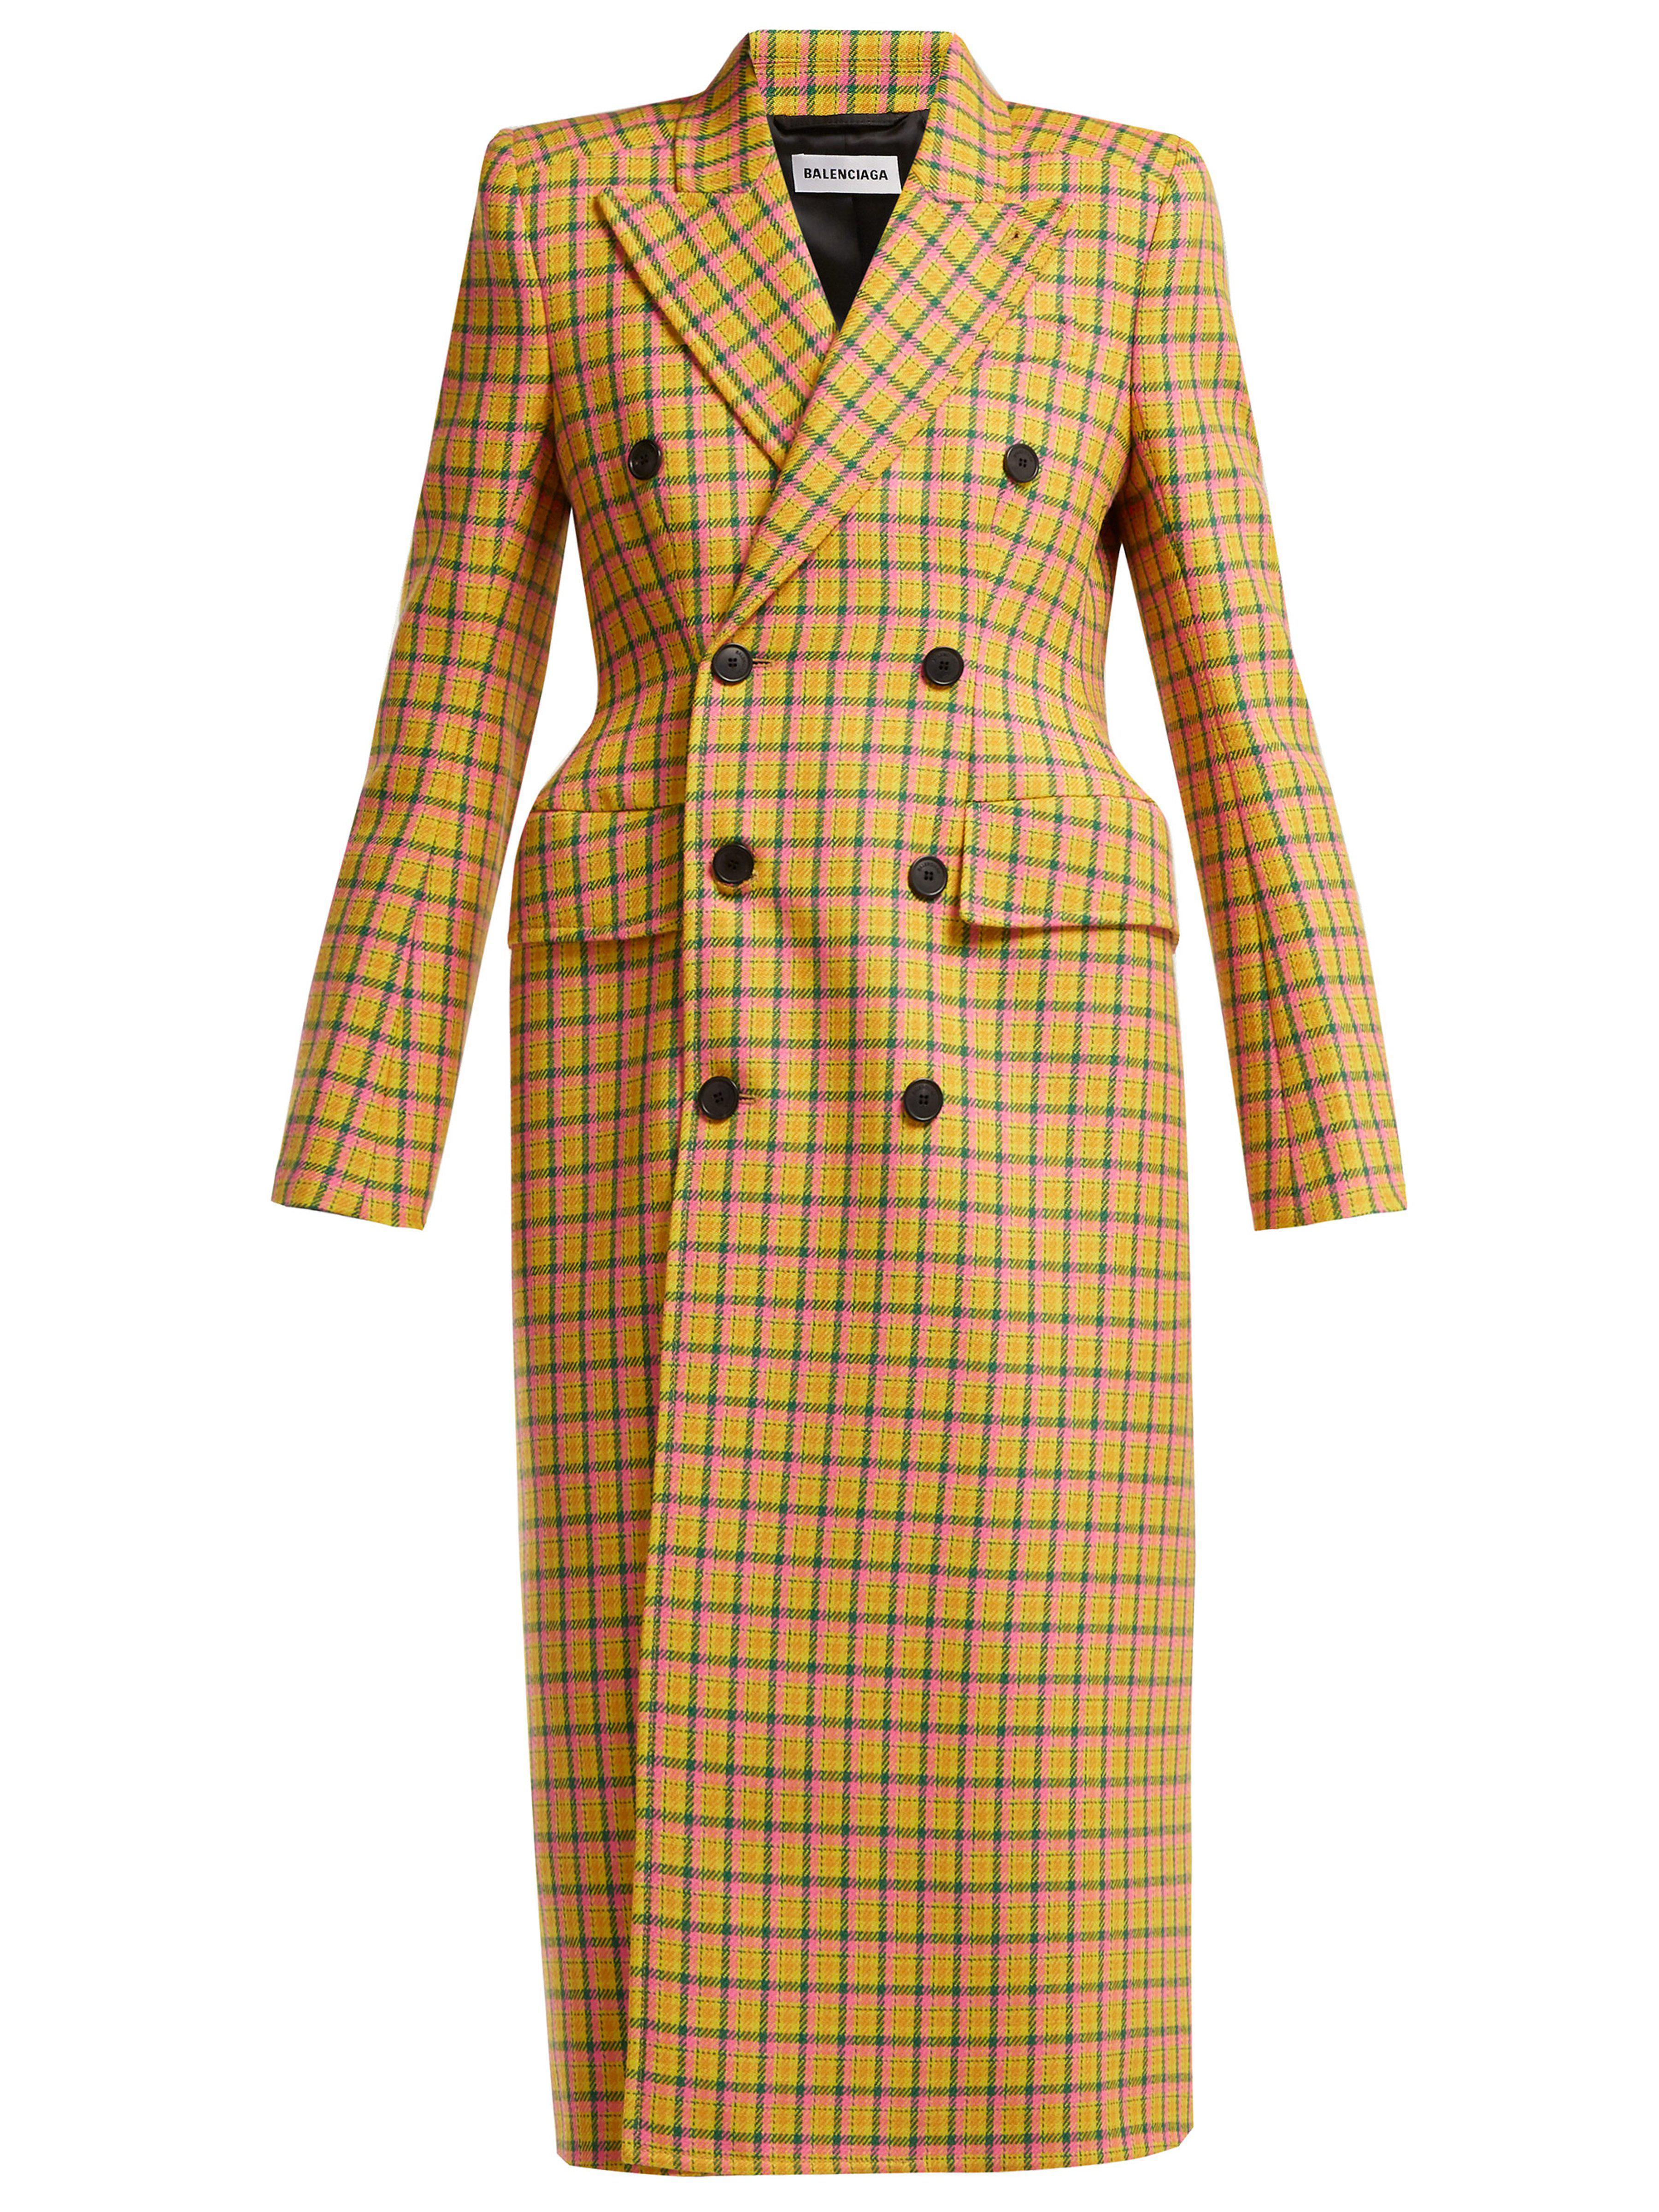 Balenciaga - Yellow Hourglass Tartan Virgin Wool Coat - Lyst